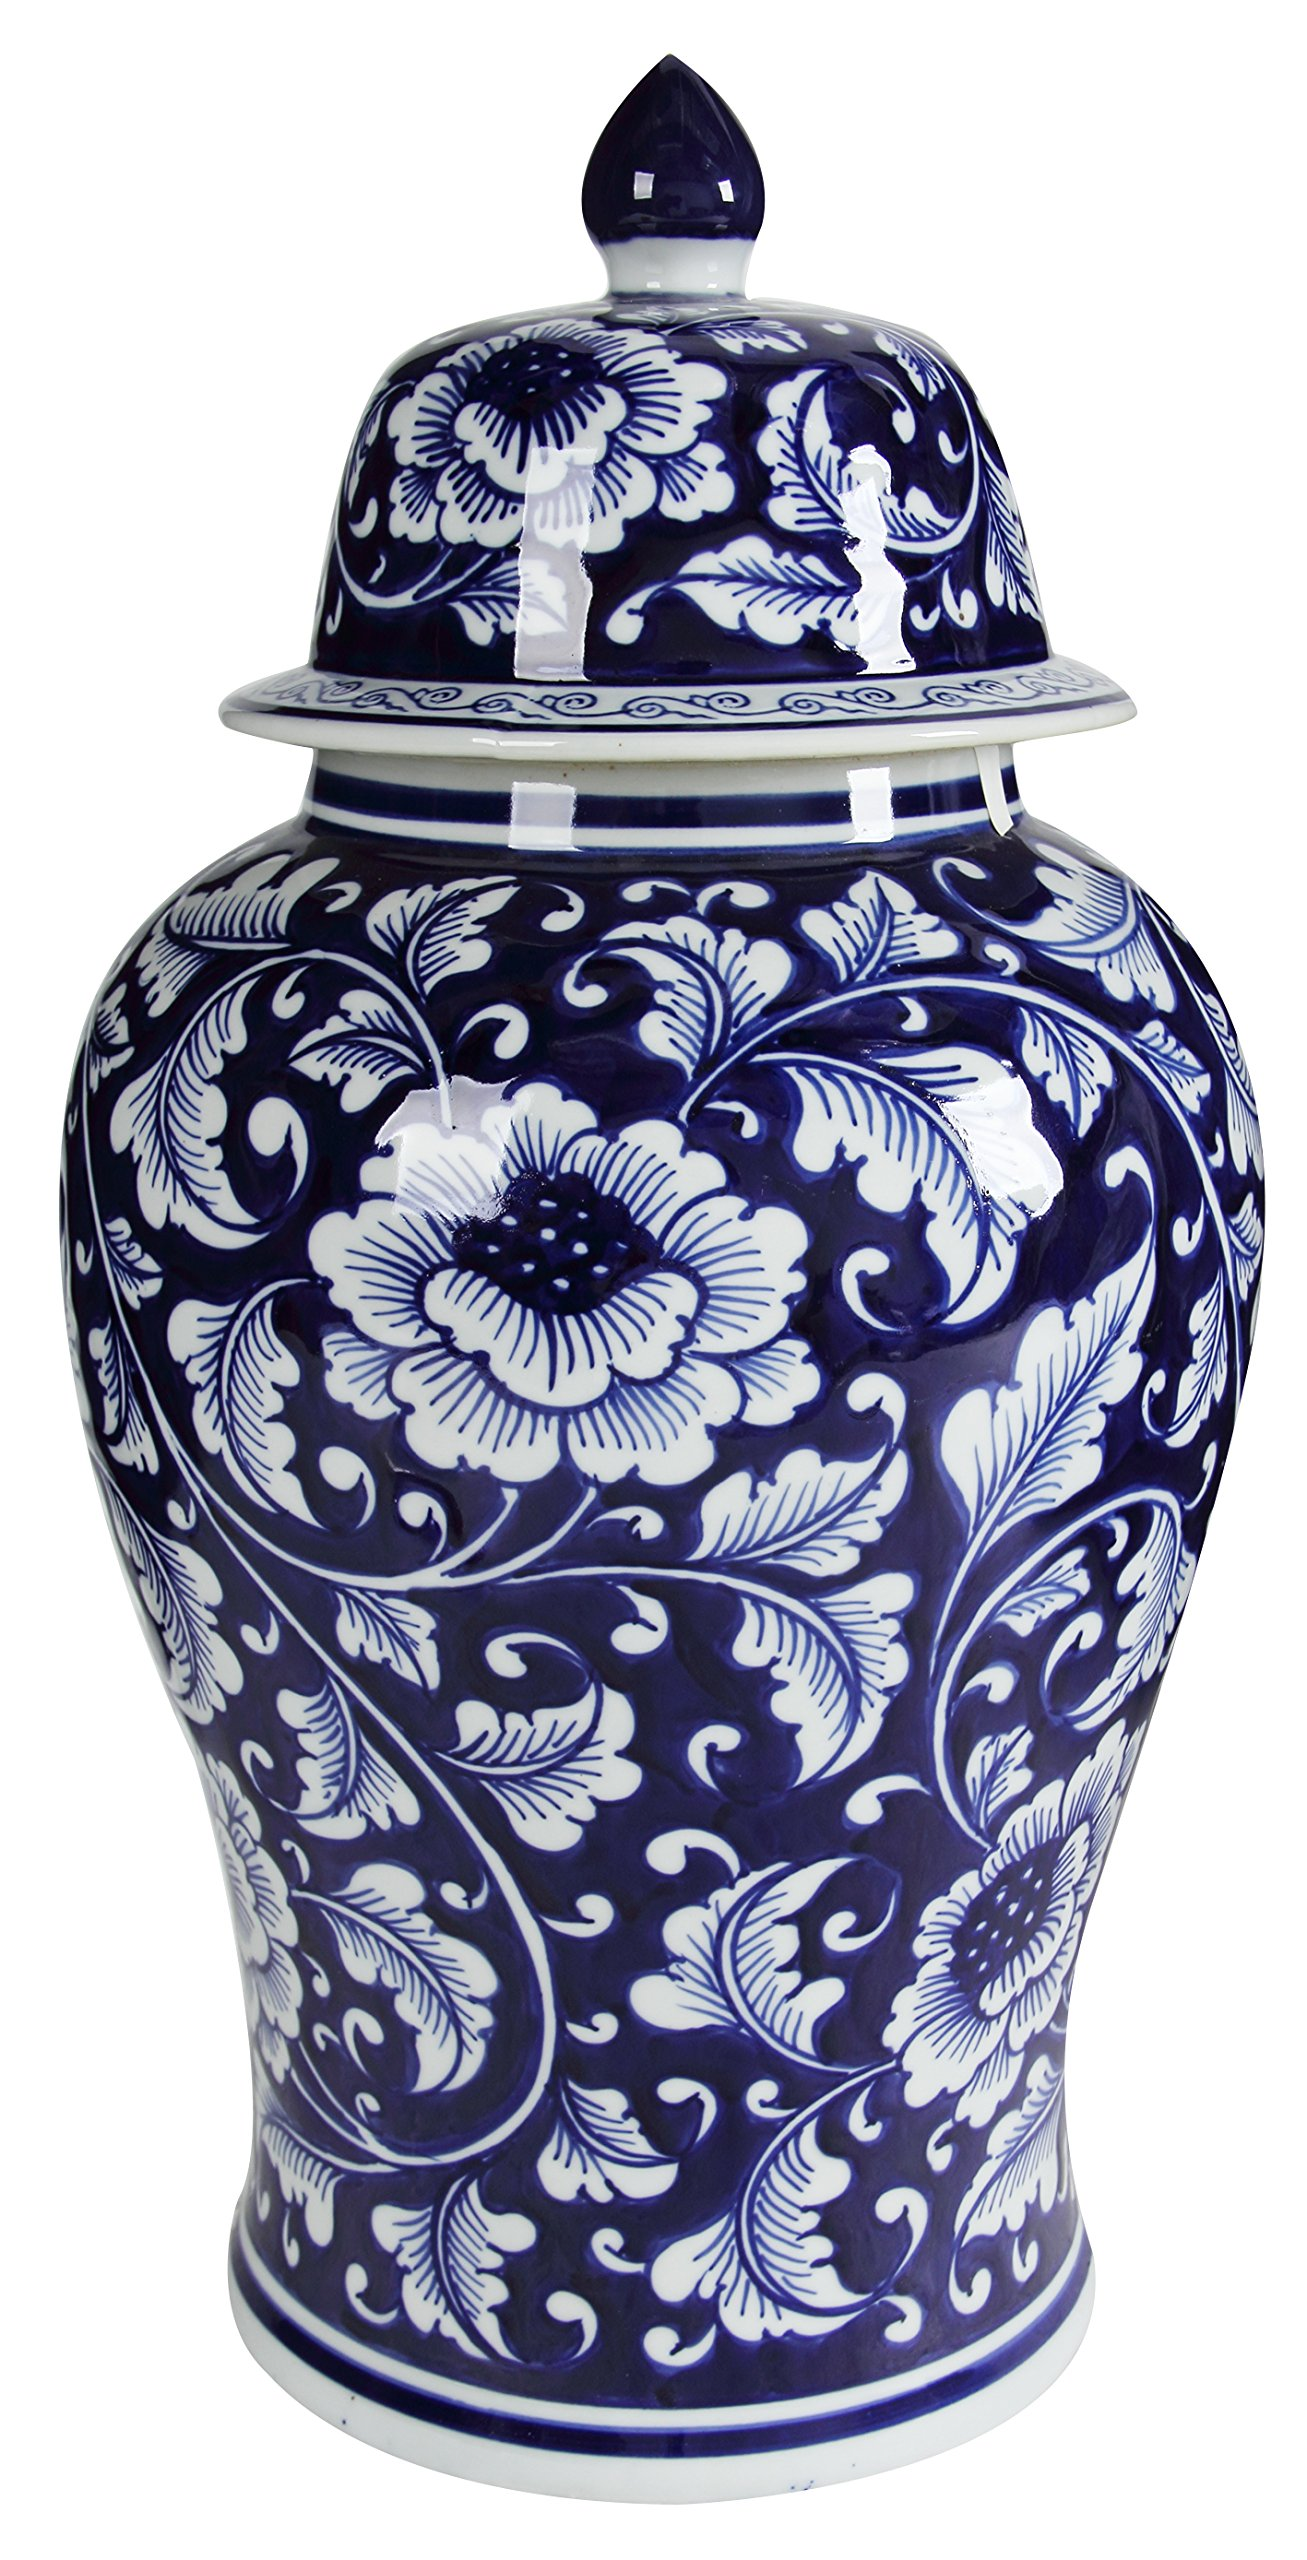 Benjara Benzara BM145820 Bold Floral Decorative Jar with Lid, Blue and White, by Benjara